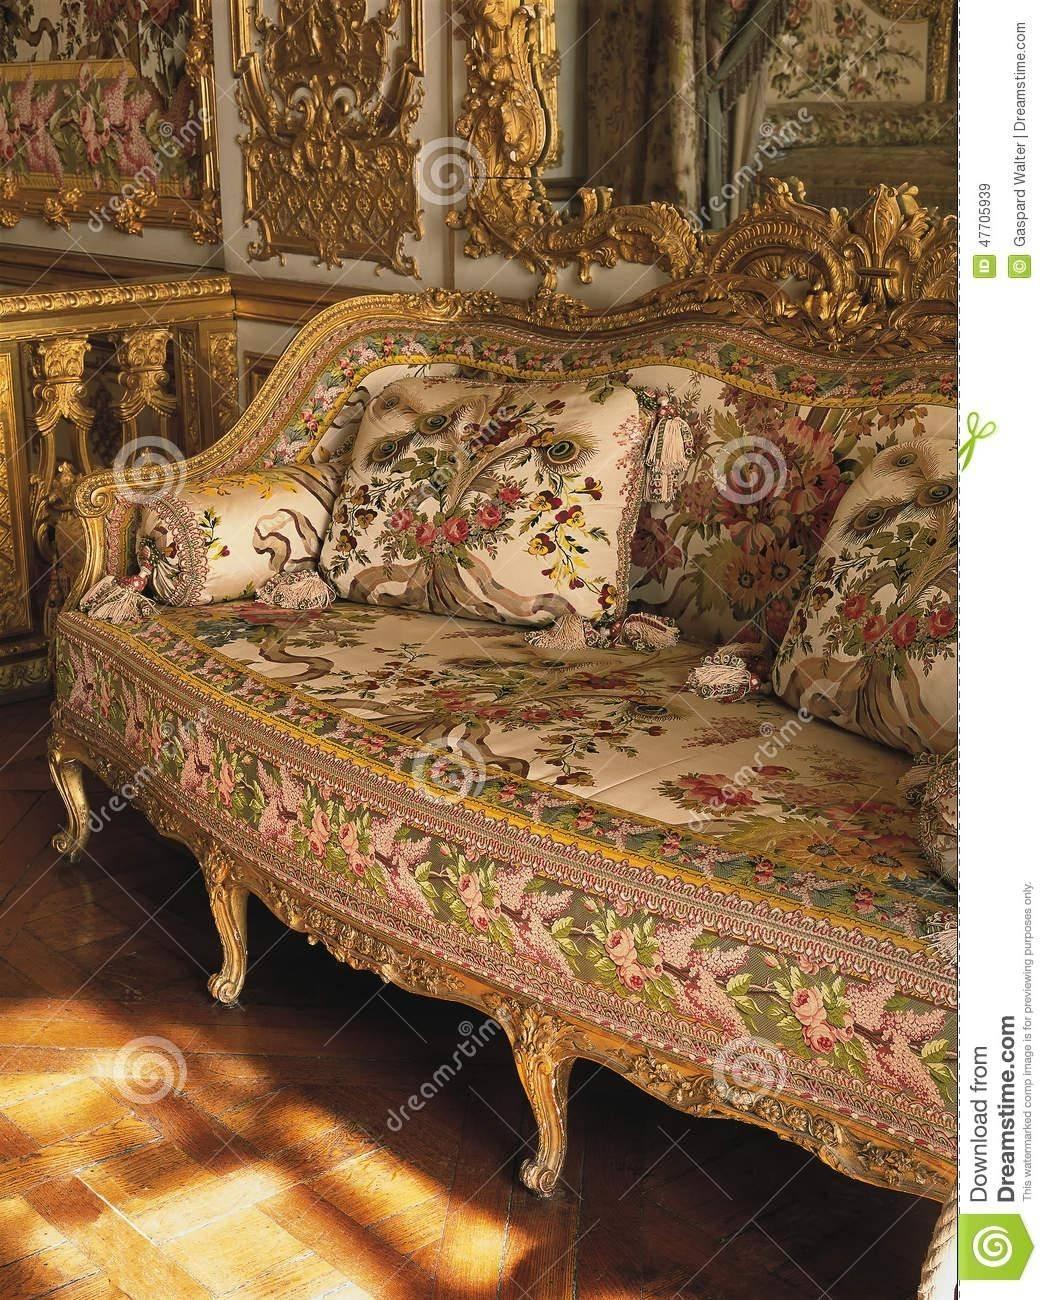 Sofa Ideas: Antoinette Sofas (Explore #15 Of 20 Photos) for Antoinette Sofas (Image 11 of 15)